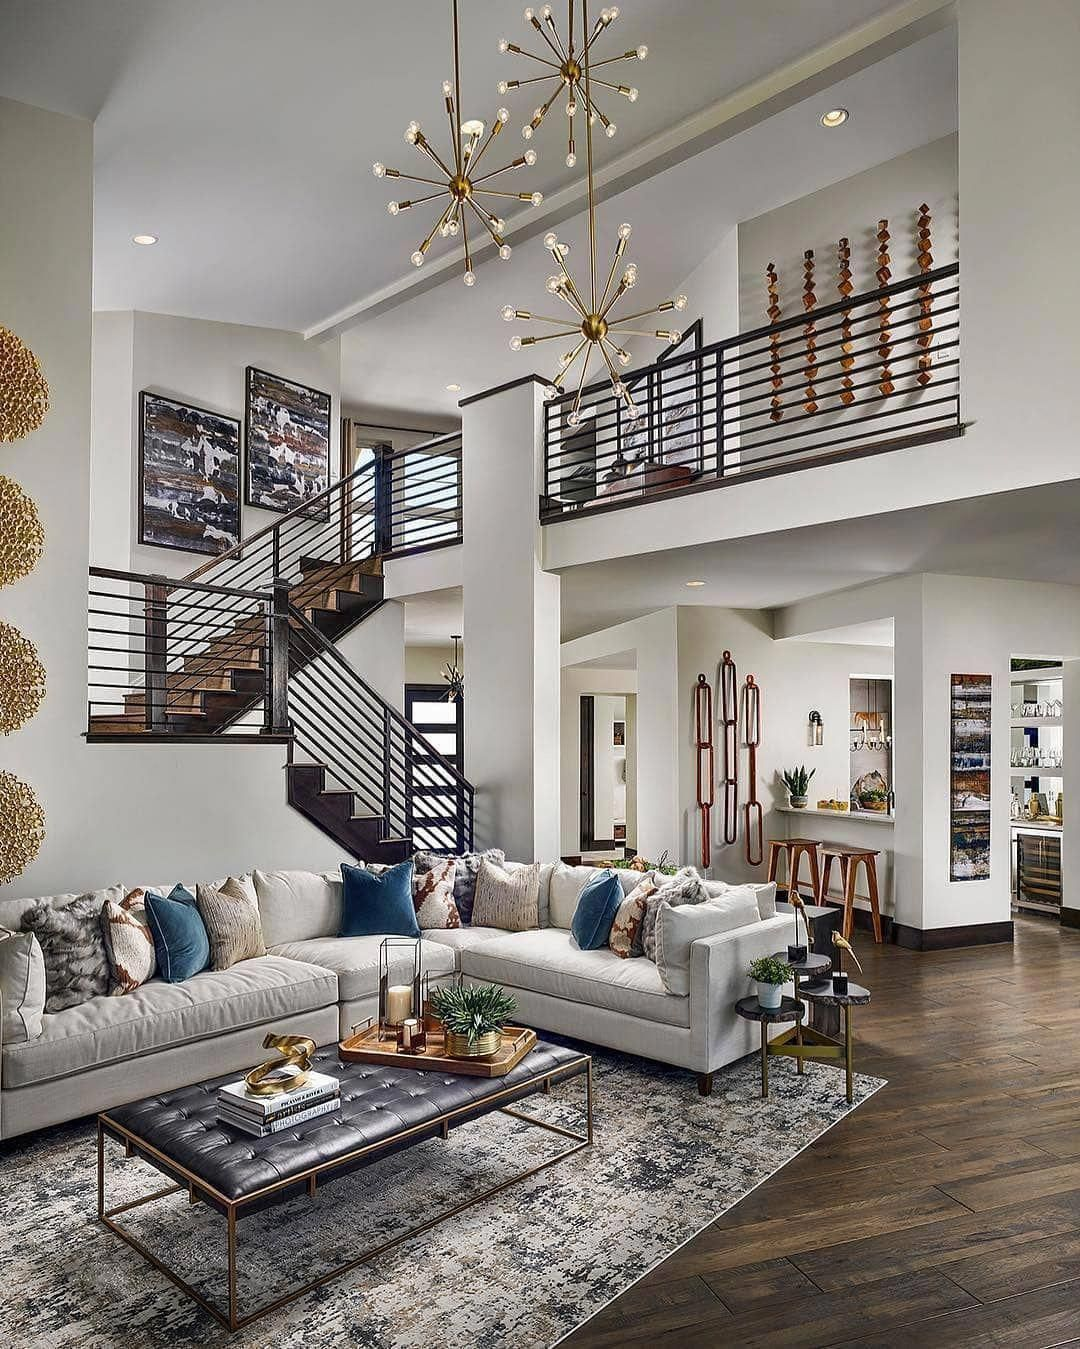 "Luxury House Designs on Instagram: ""Beautiful Designed interior"